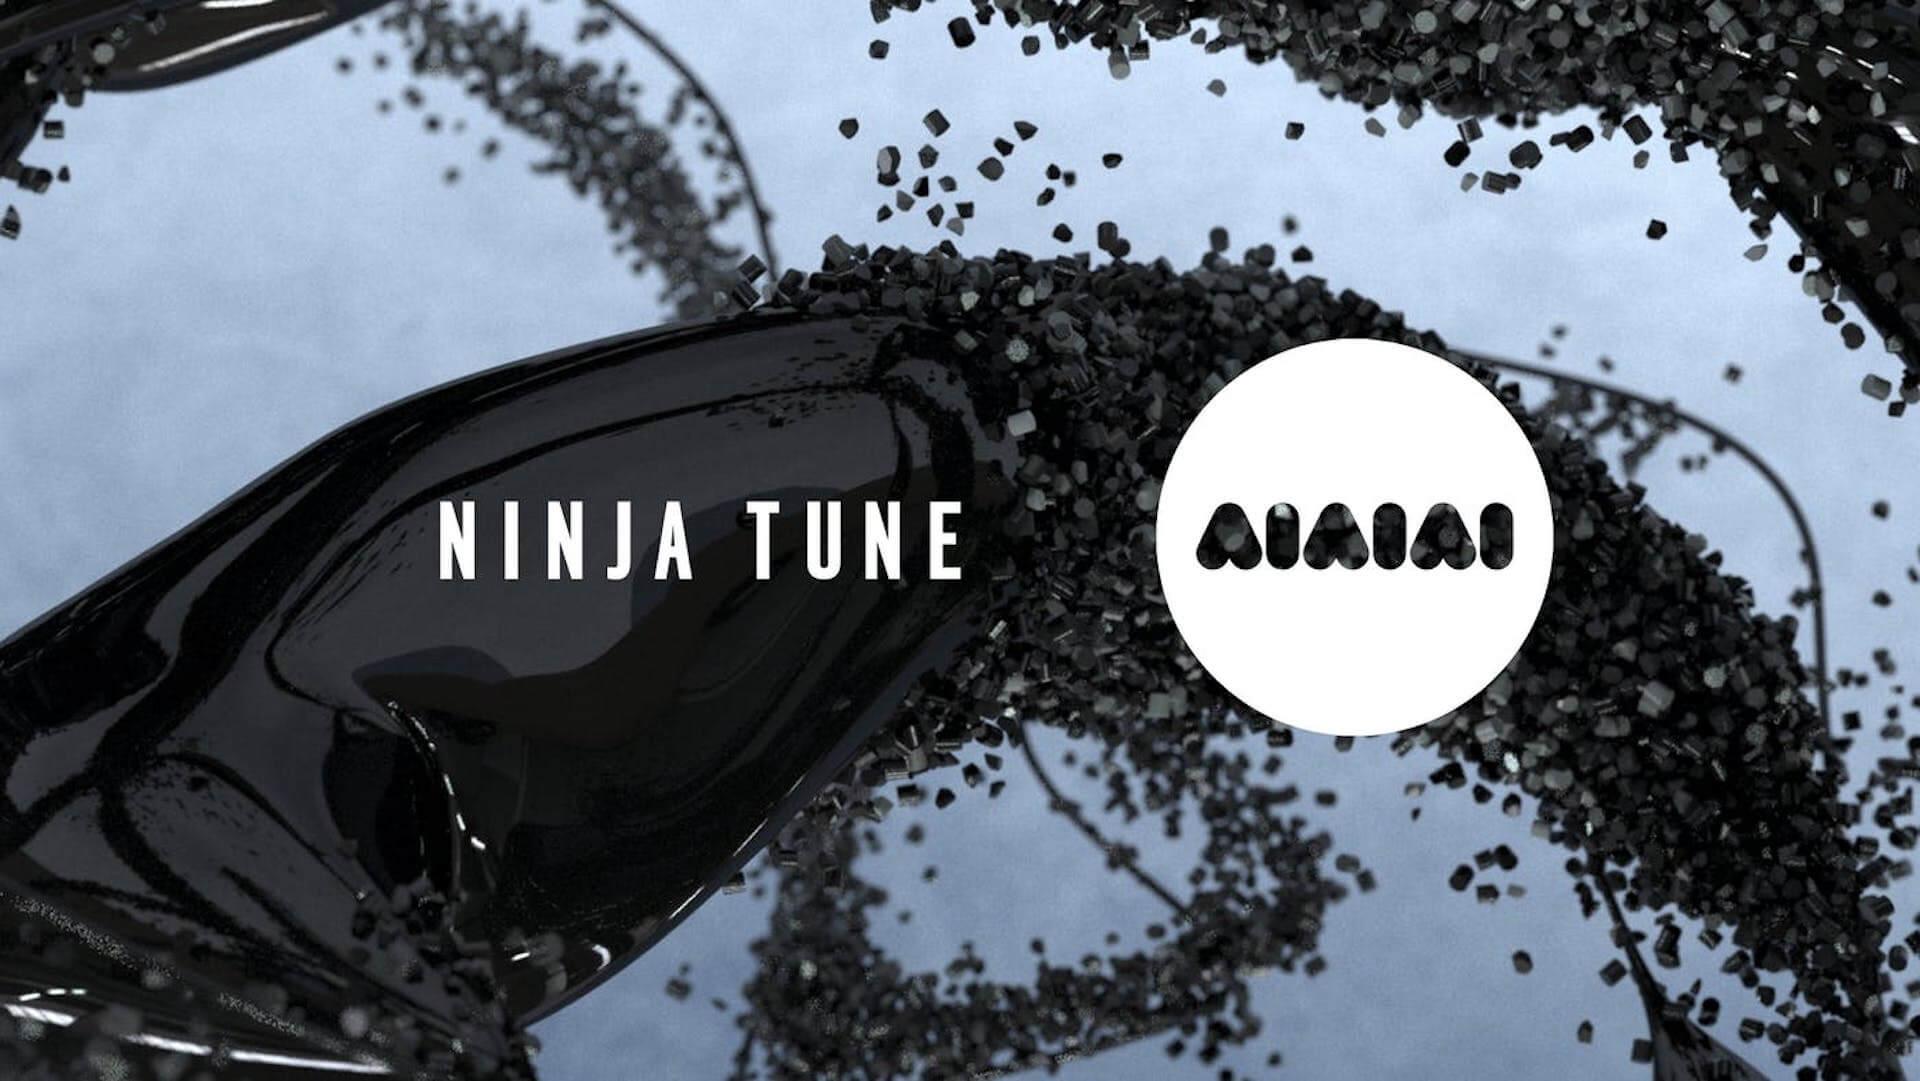 〈Ninja Tune〉とAiAiAiのコラボヘッドホン「TMA-2 Ninja Tune Edition」が本日発売! tech210618_ninjatune_aiaiai_2